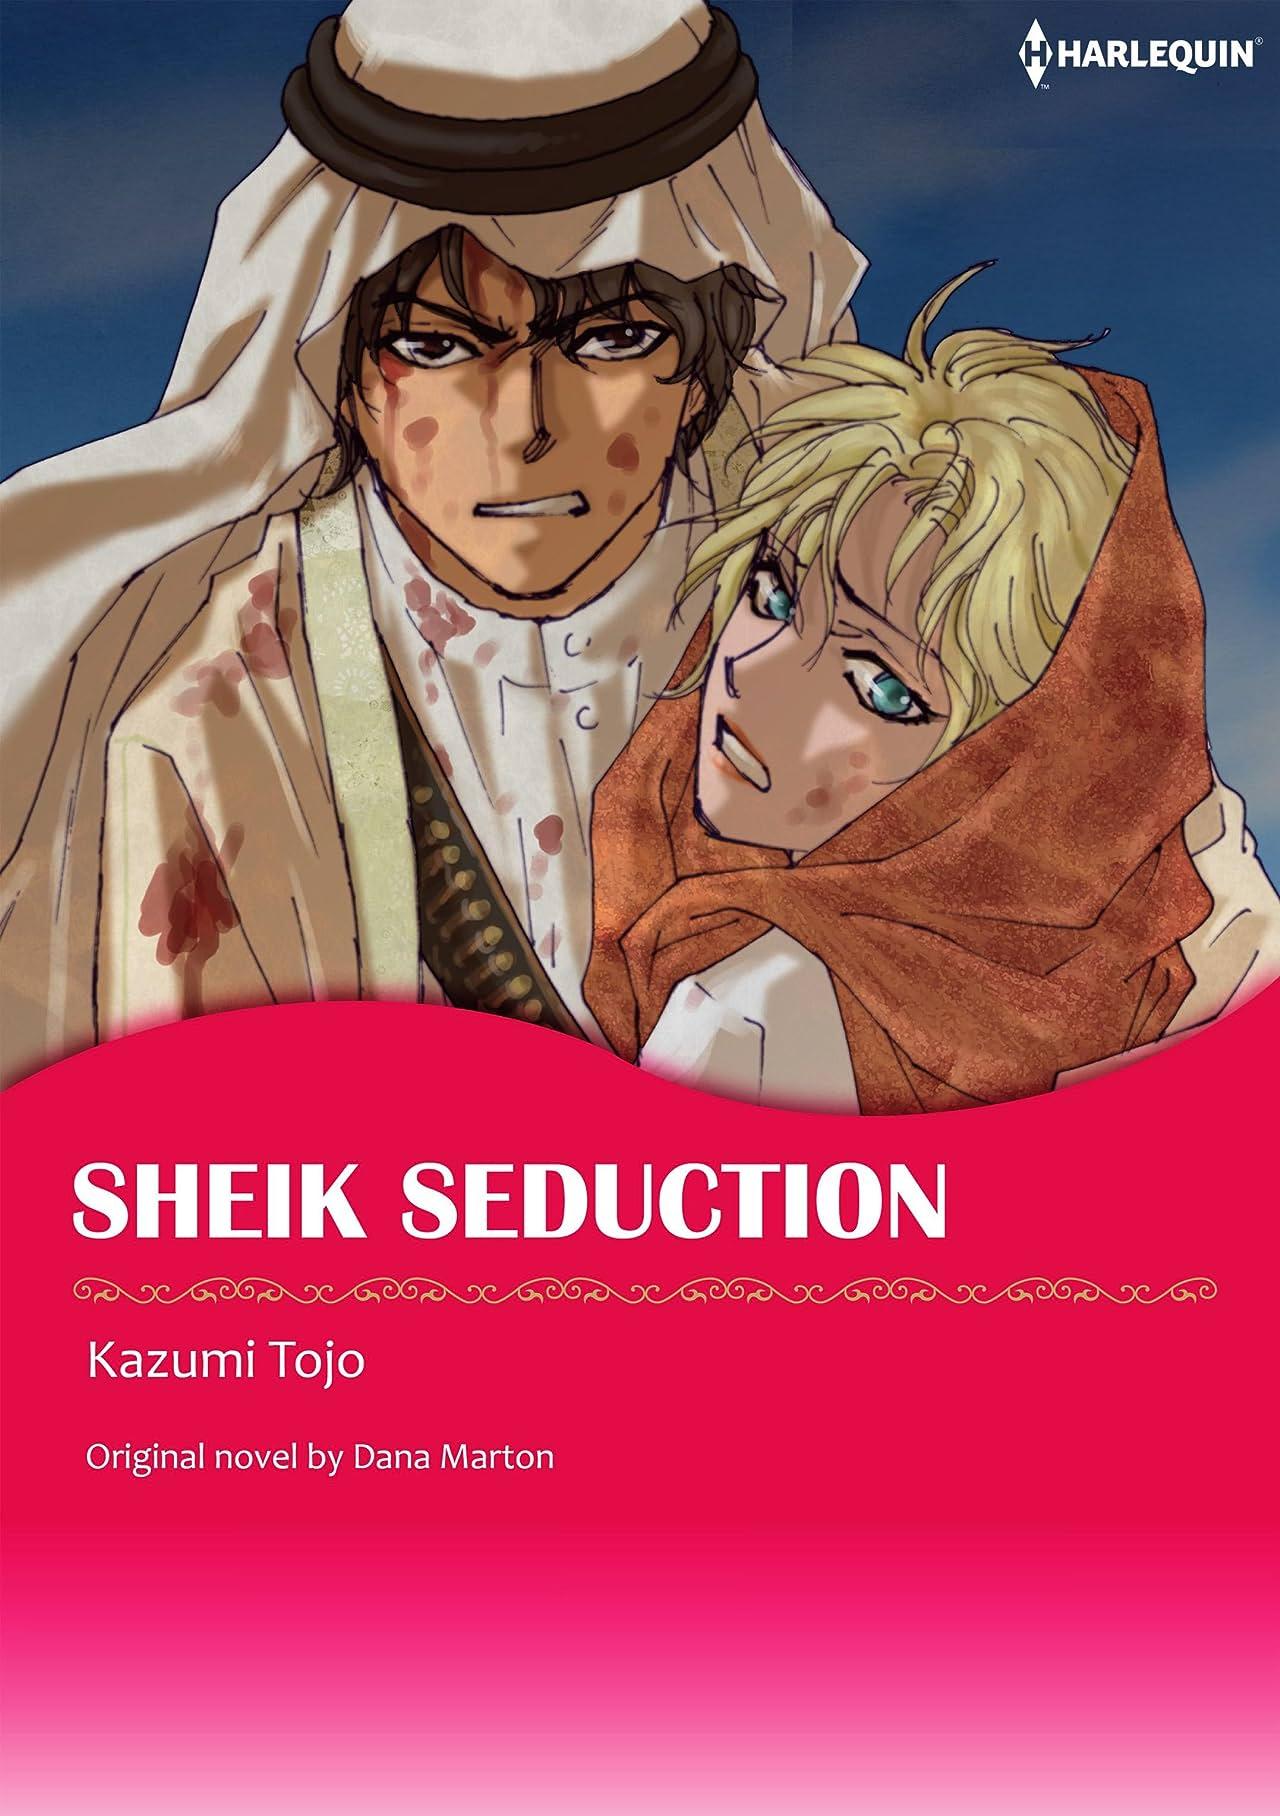 Sheik Seduction